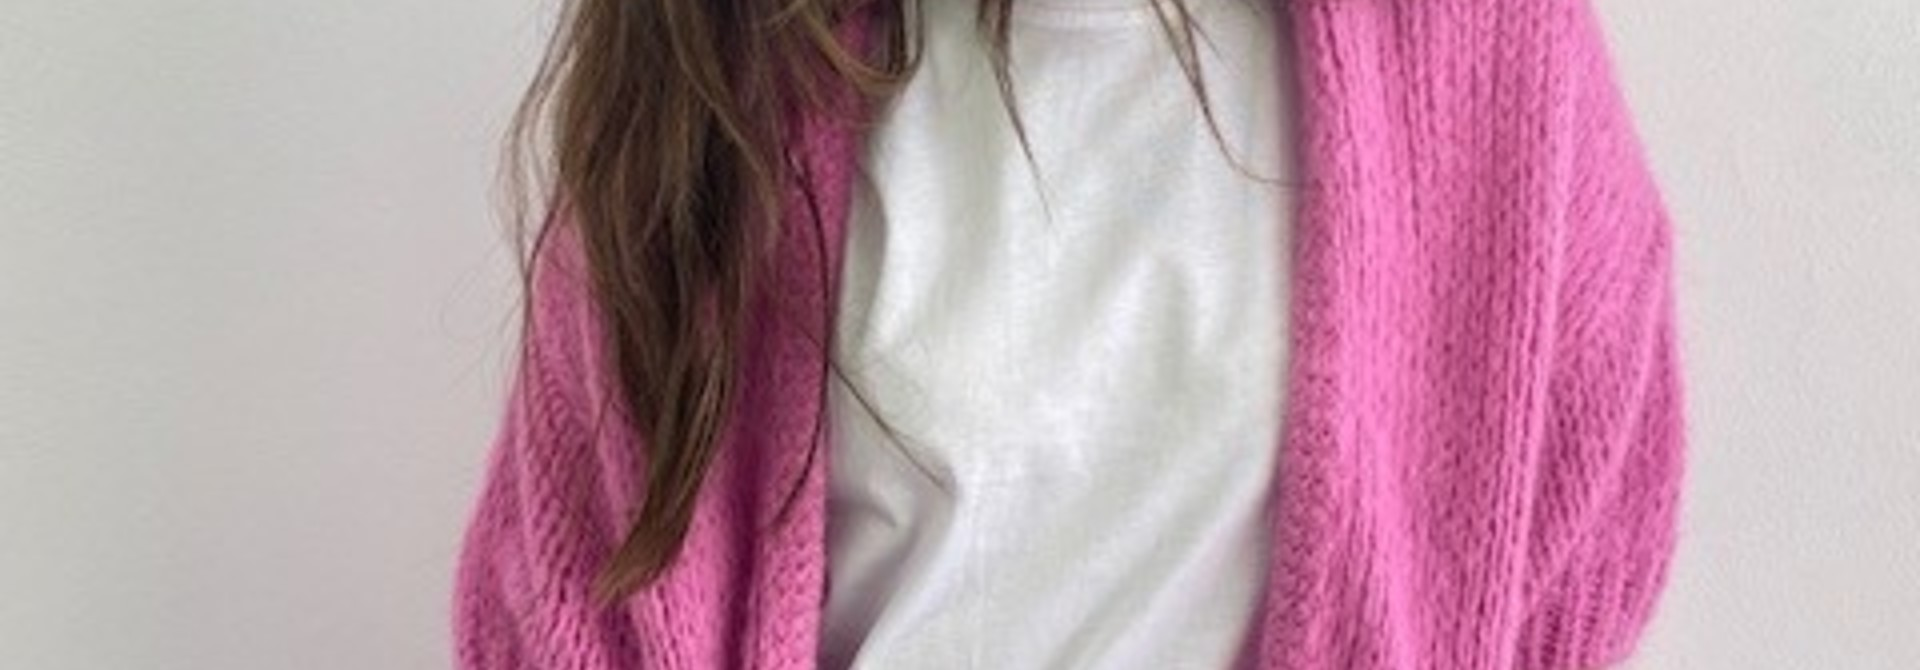 Lyssa short sleeve bernadette Cyclamen